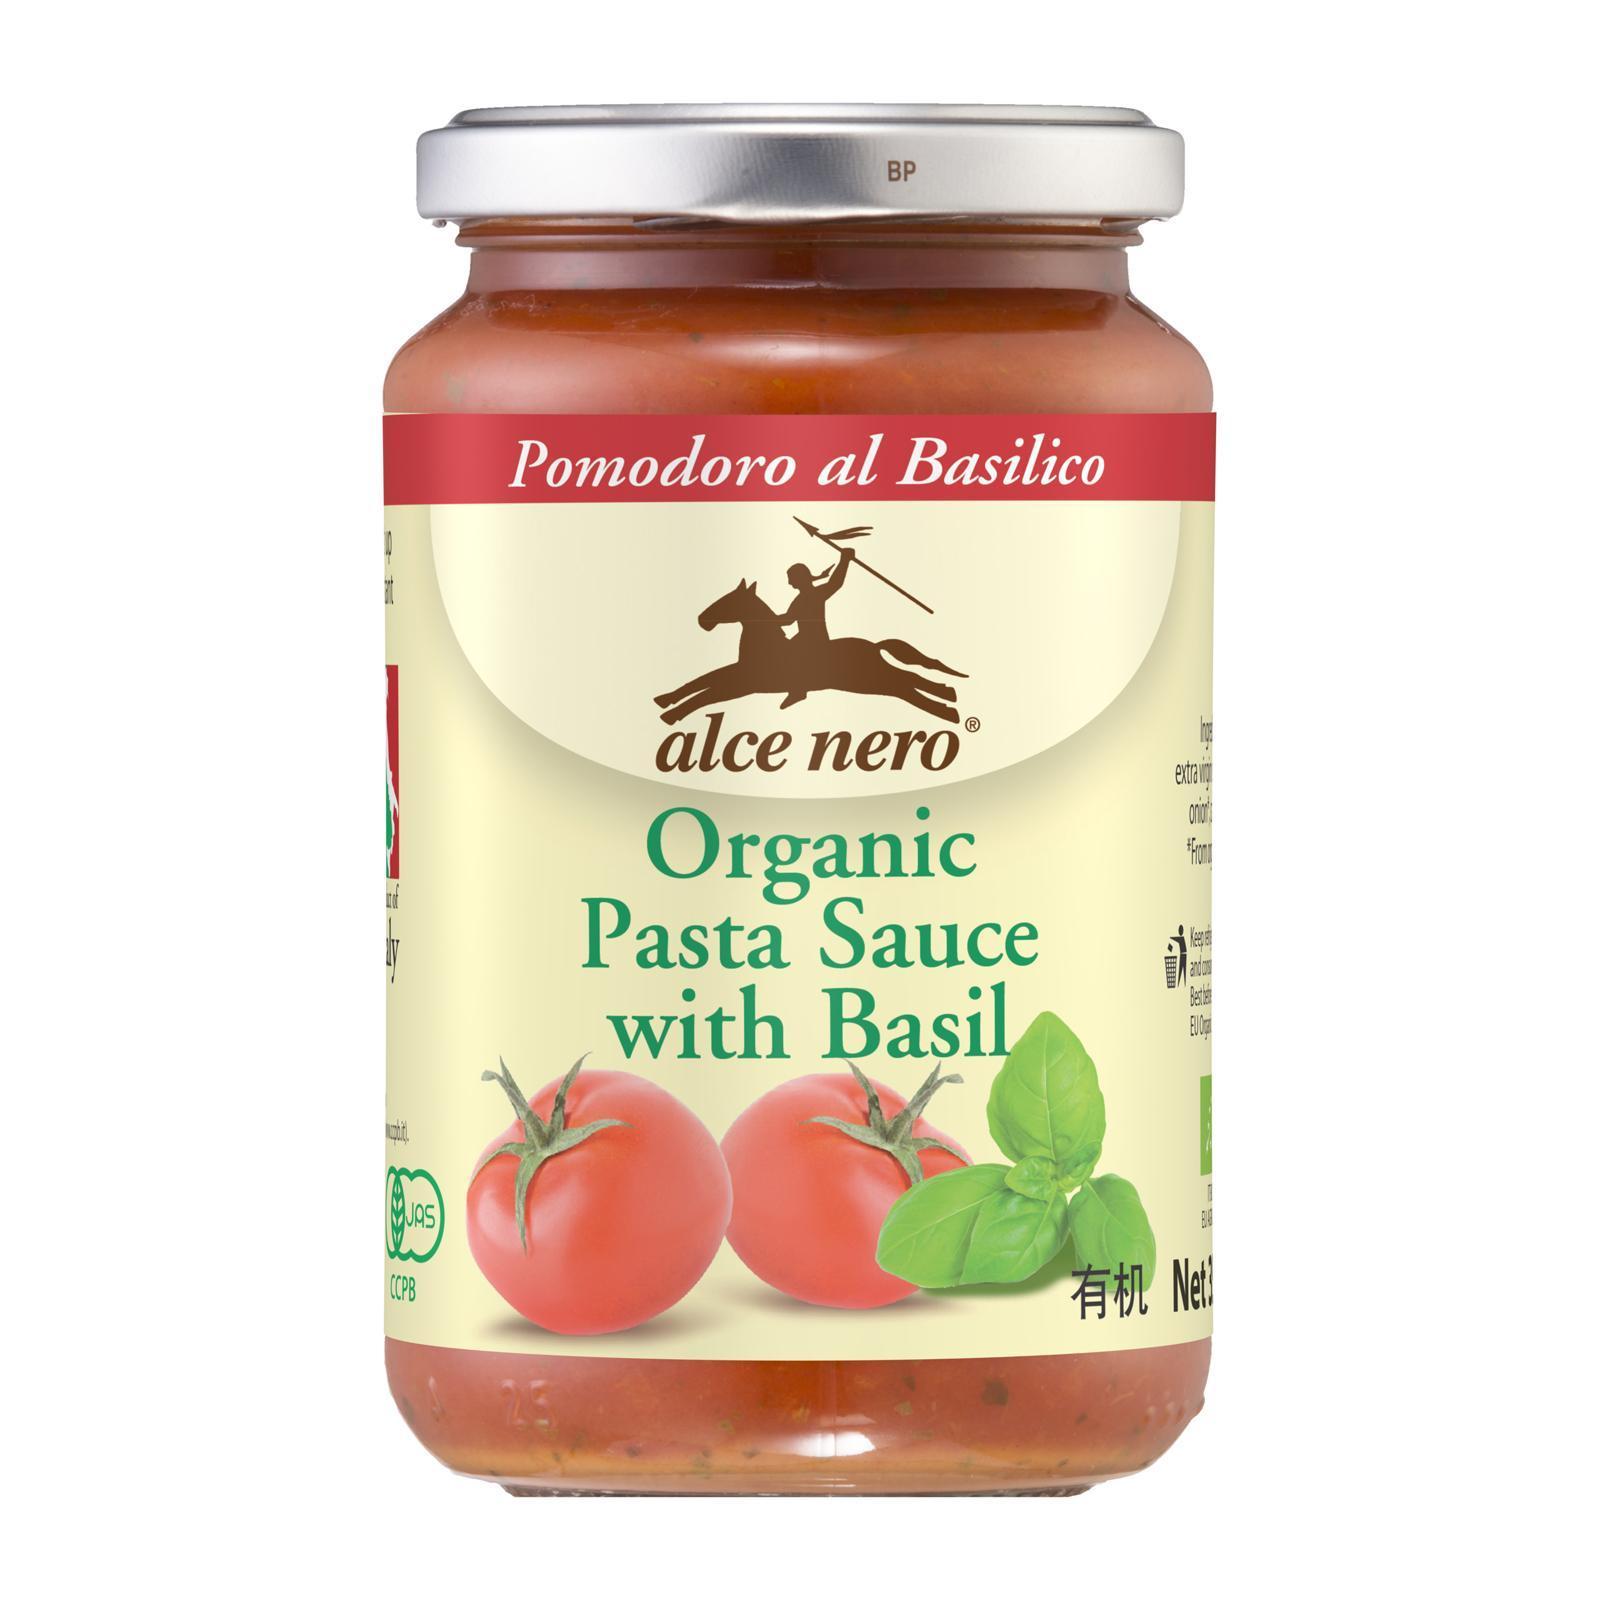 ALCE NERO Organic Pasta Sauce With Basil 350g